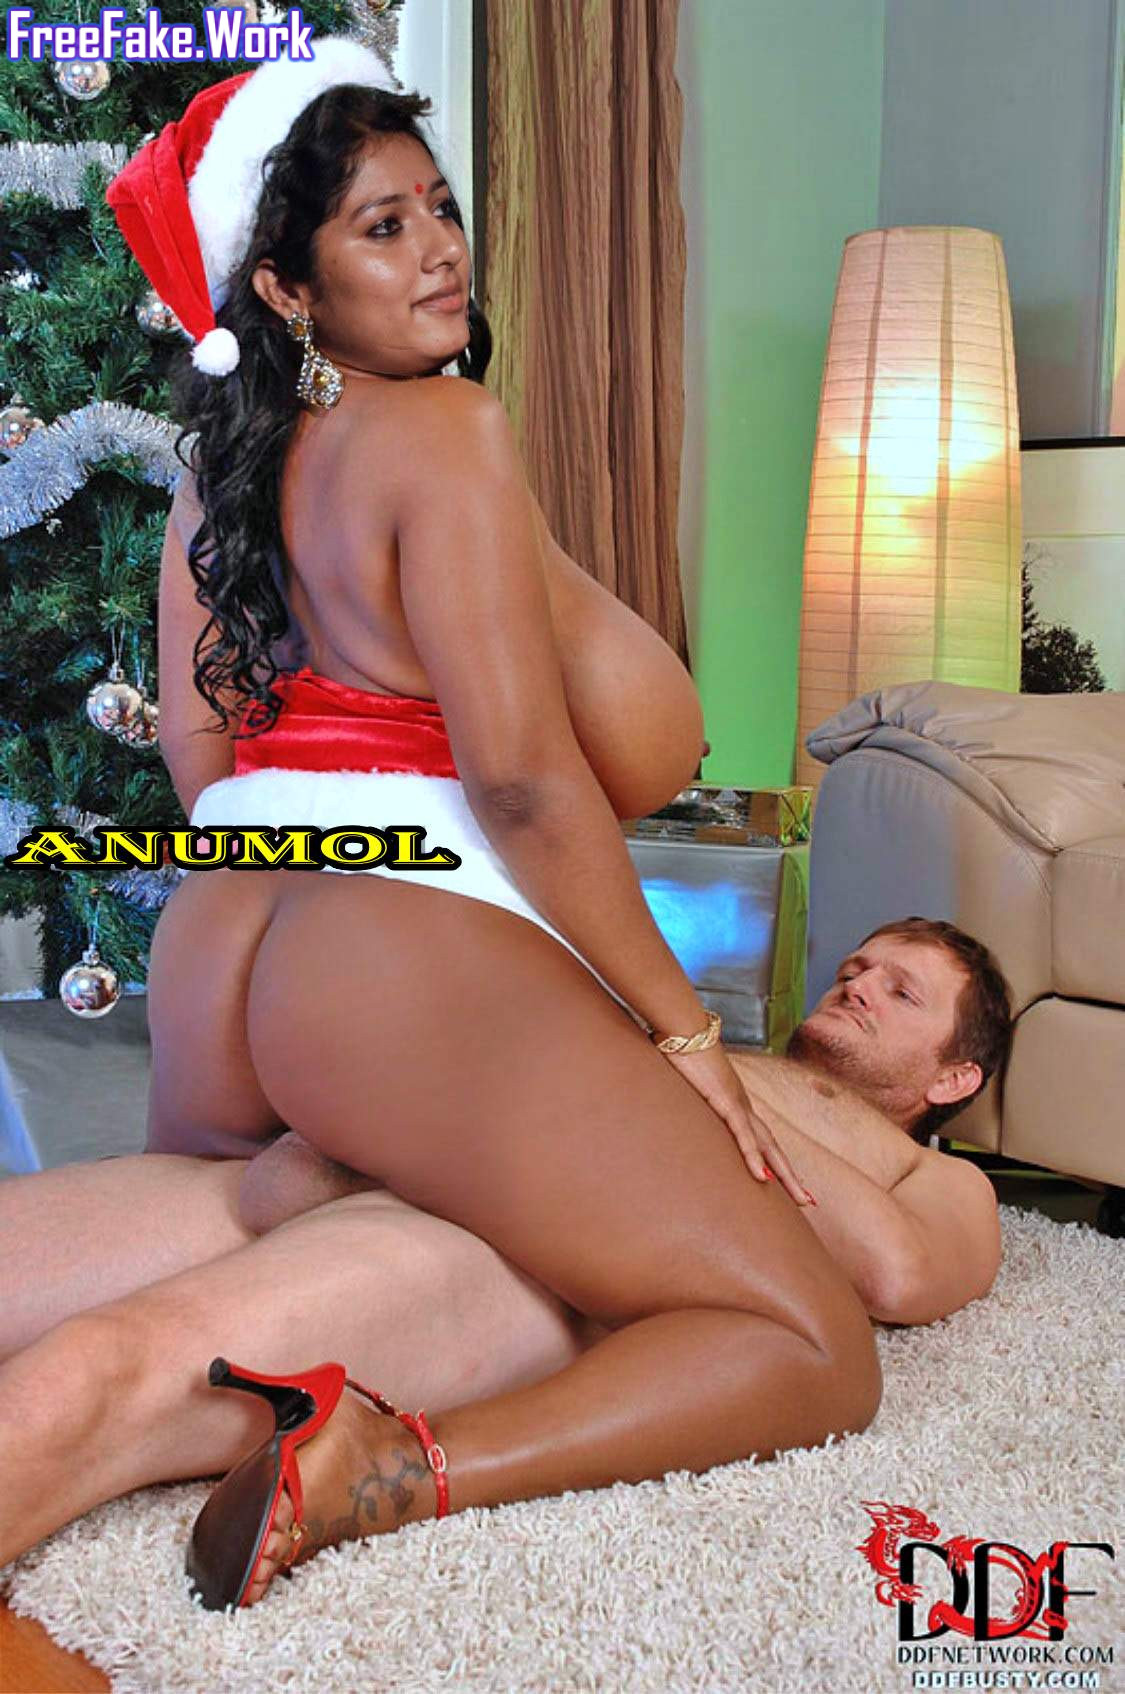 Topless-Anumol-ass-fucking-on-top-Christmas-special-sex.jpg